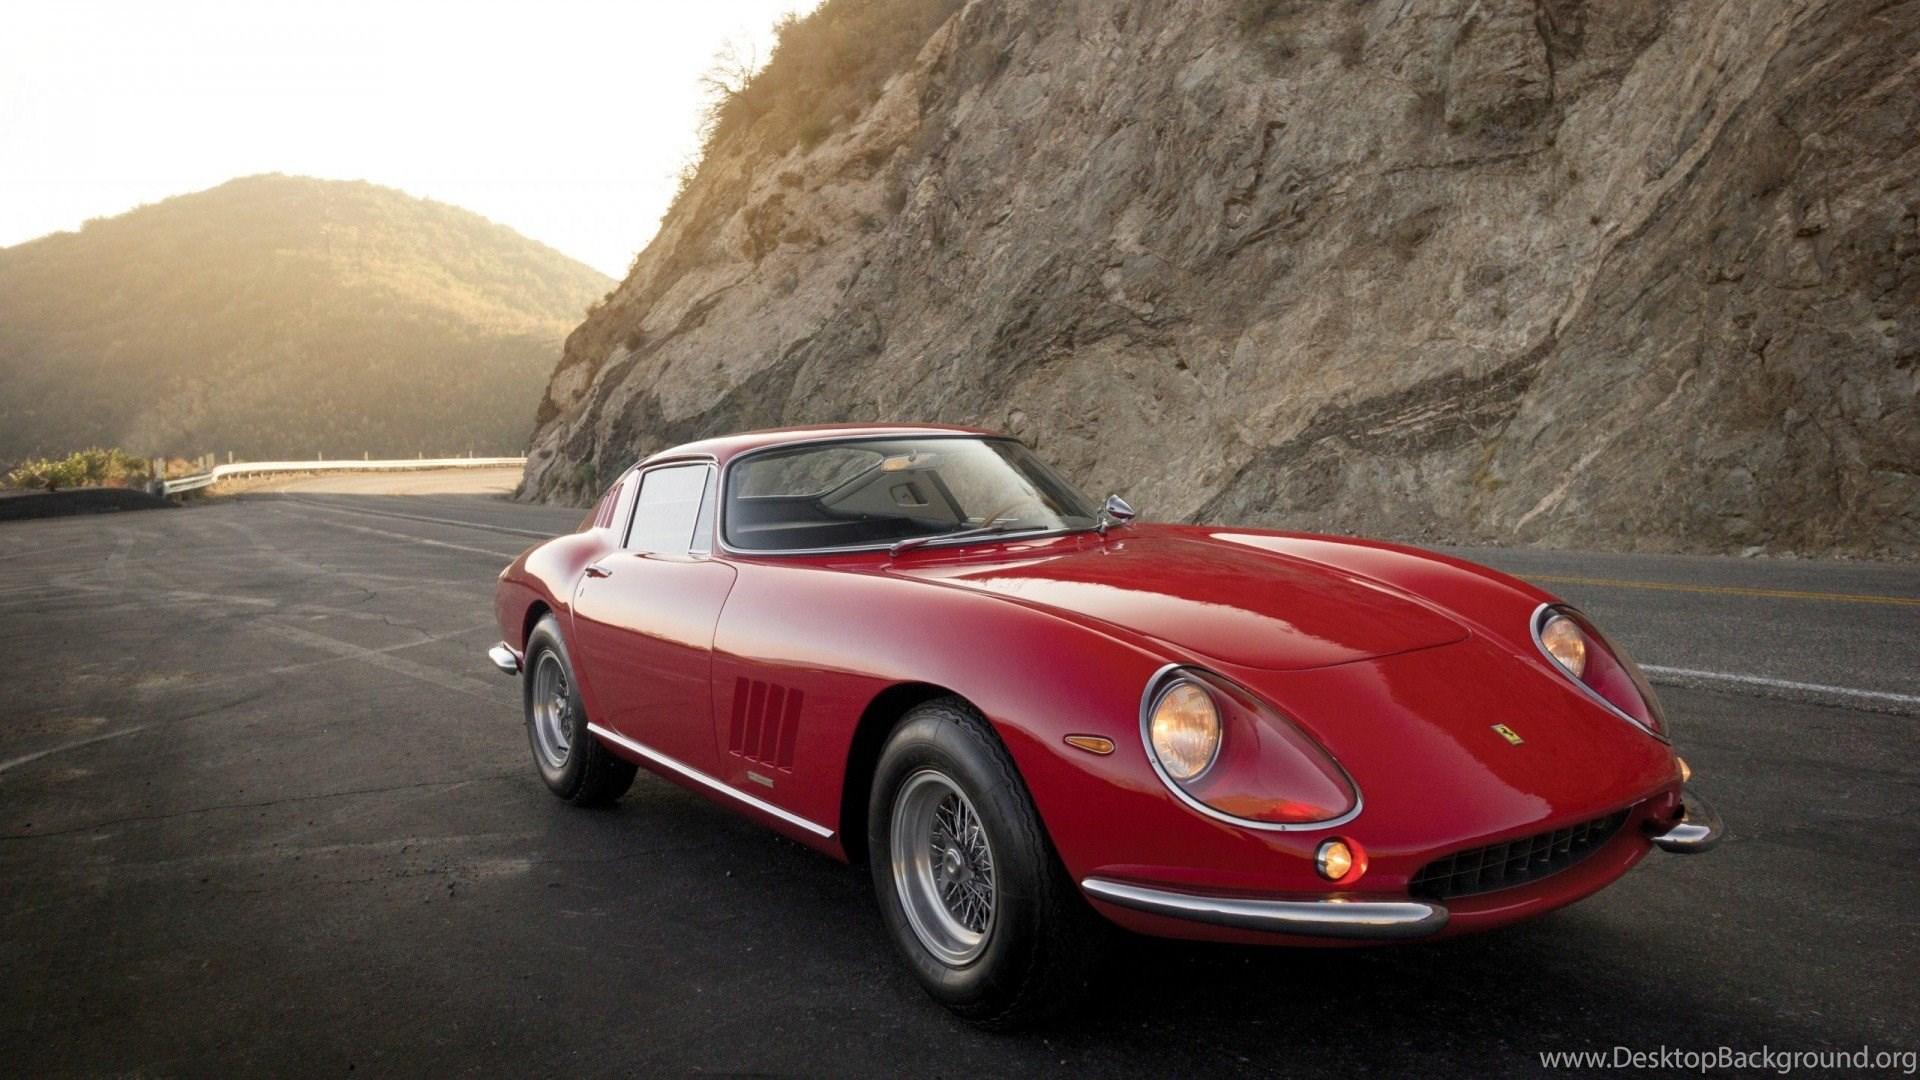 Ferrari 275 Gtb Classic Car Wallpapers For Desktop Mobile Desktop Background